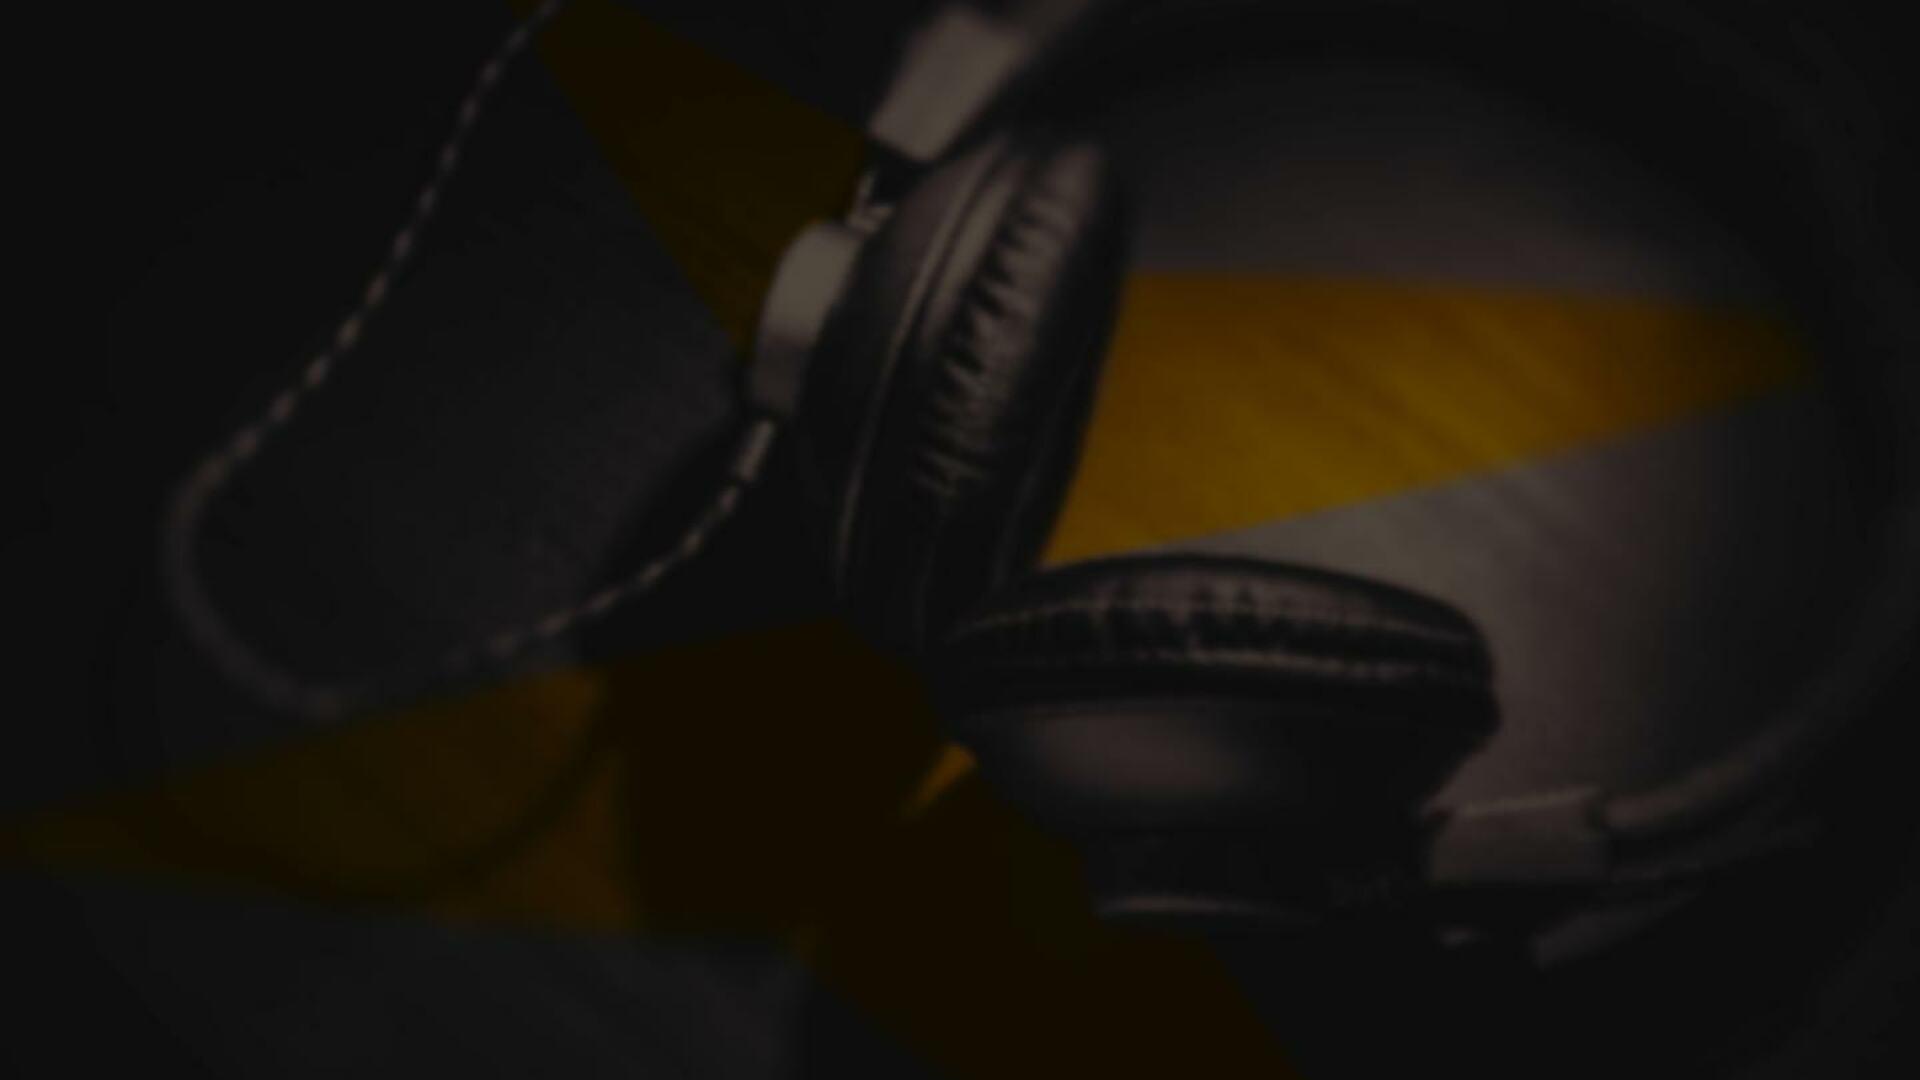 Listen to our Spotify radio